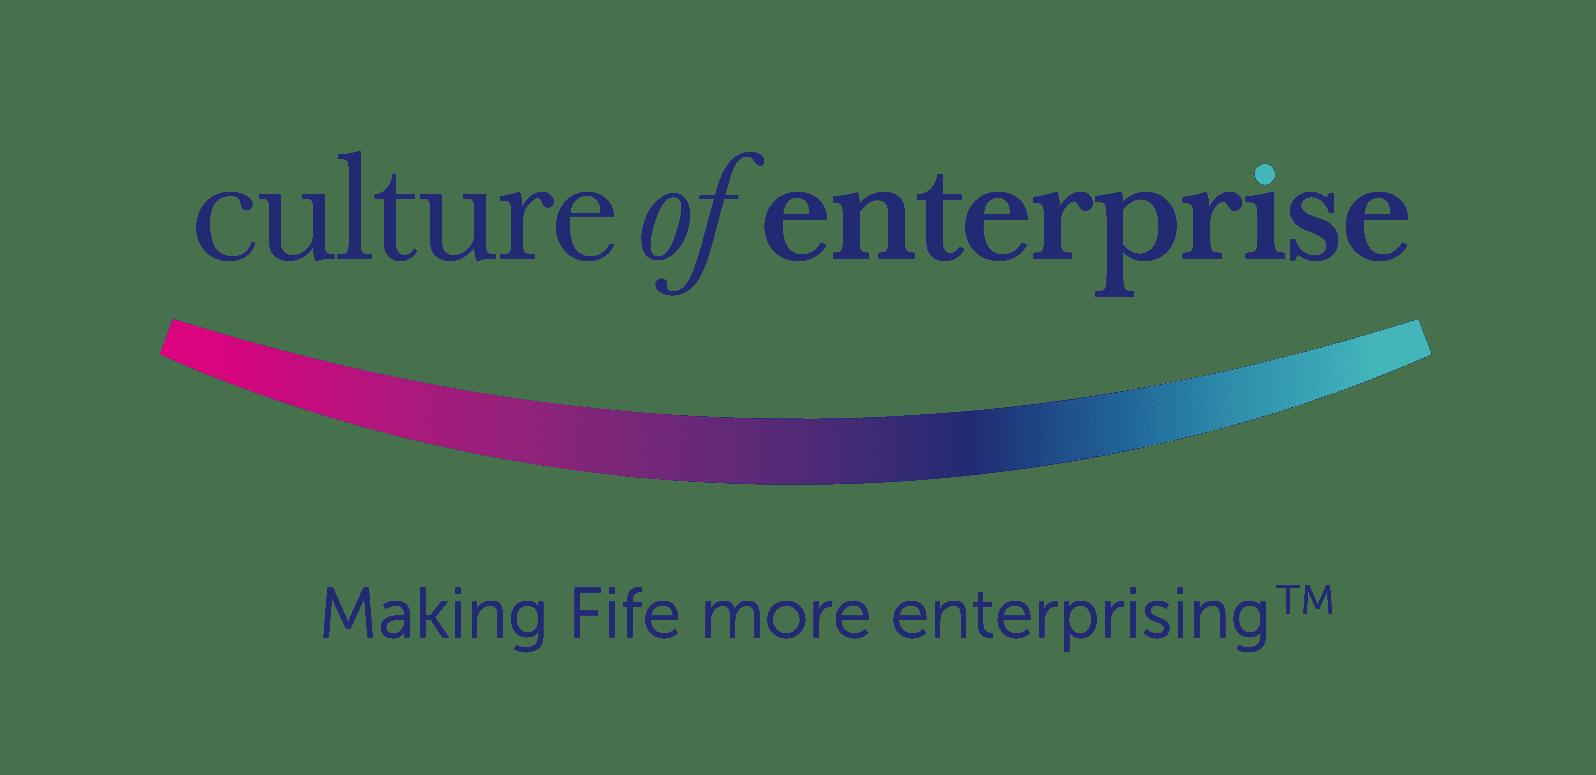 culture of enterprise logo